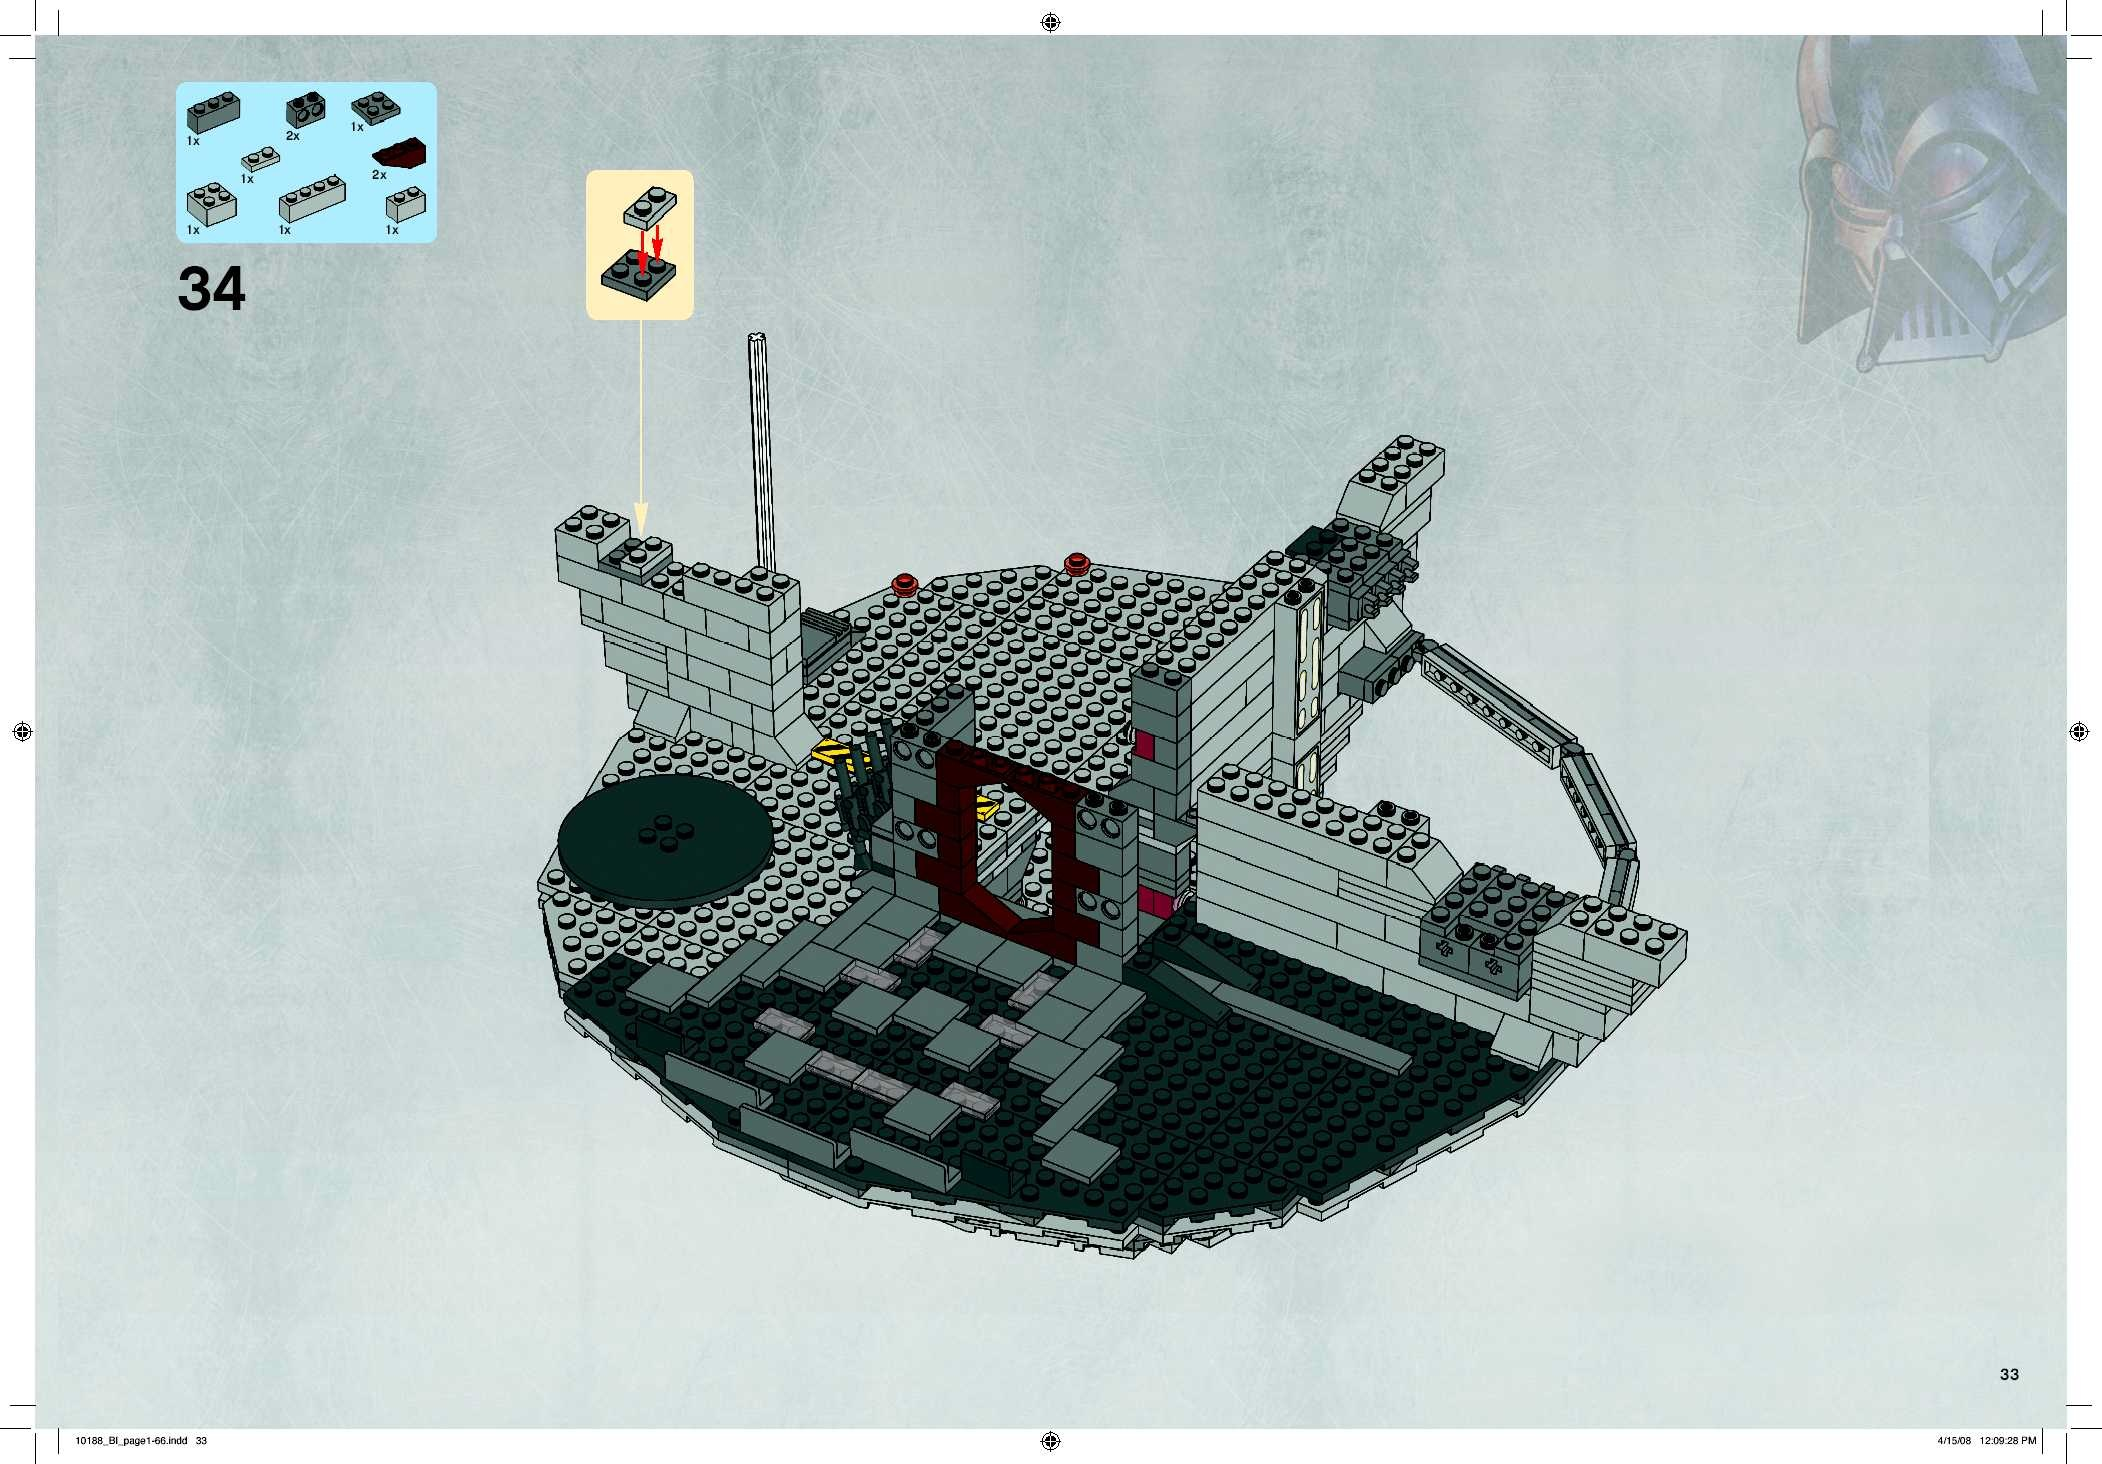 lego star wars 10188 instructions